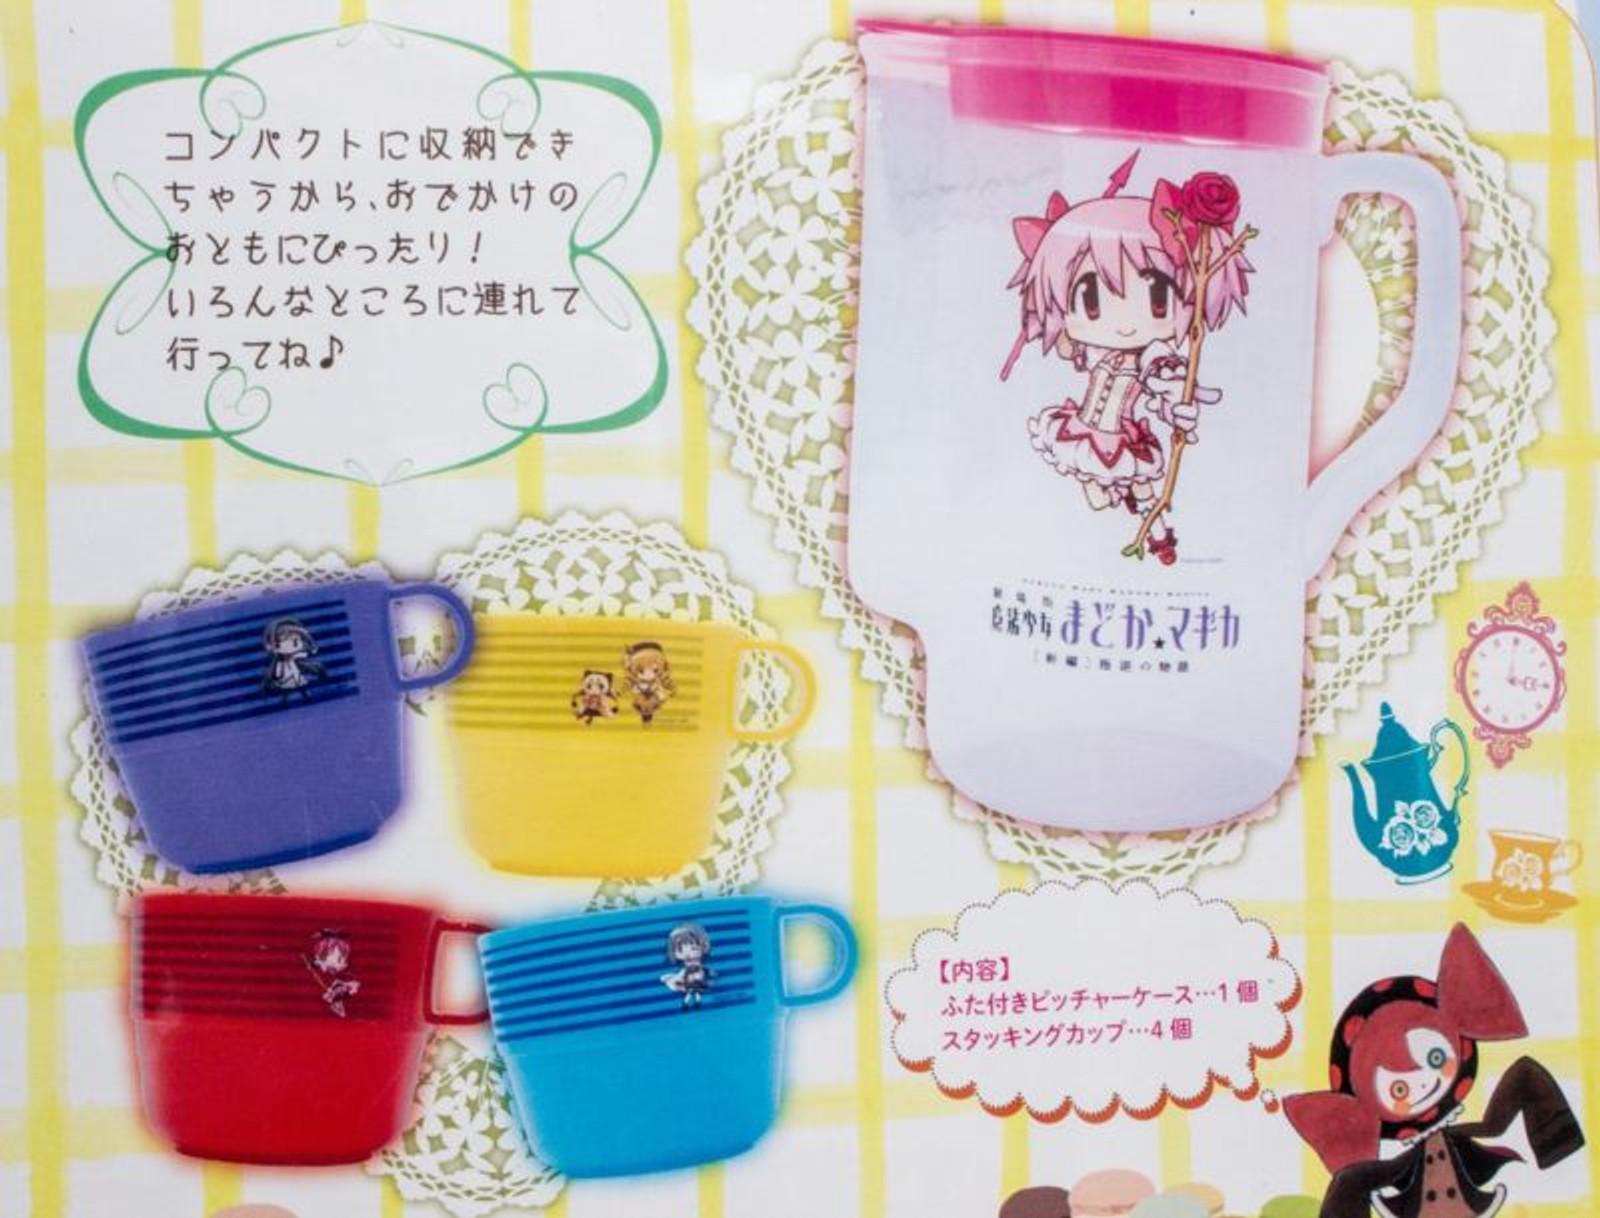 Puella Magi Madoka Magica Pitcher & Mag Cup Ter Party Set JAPAN ANIME